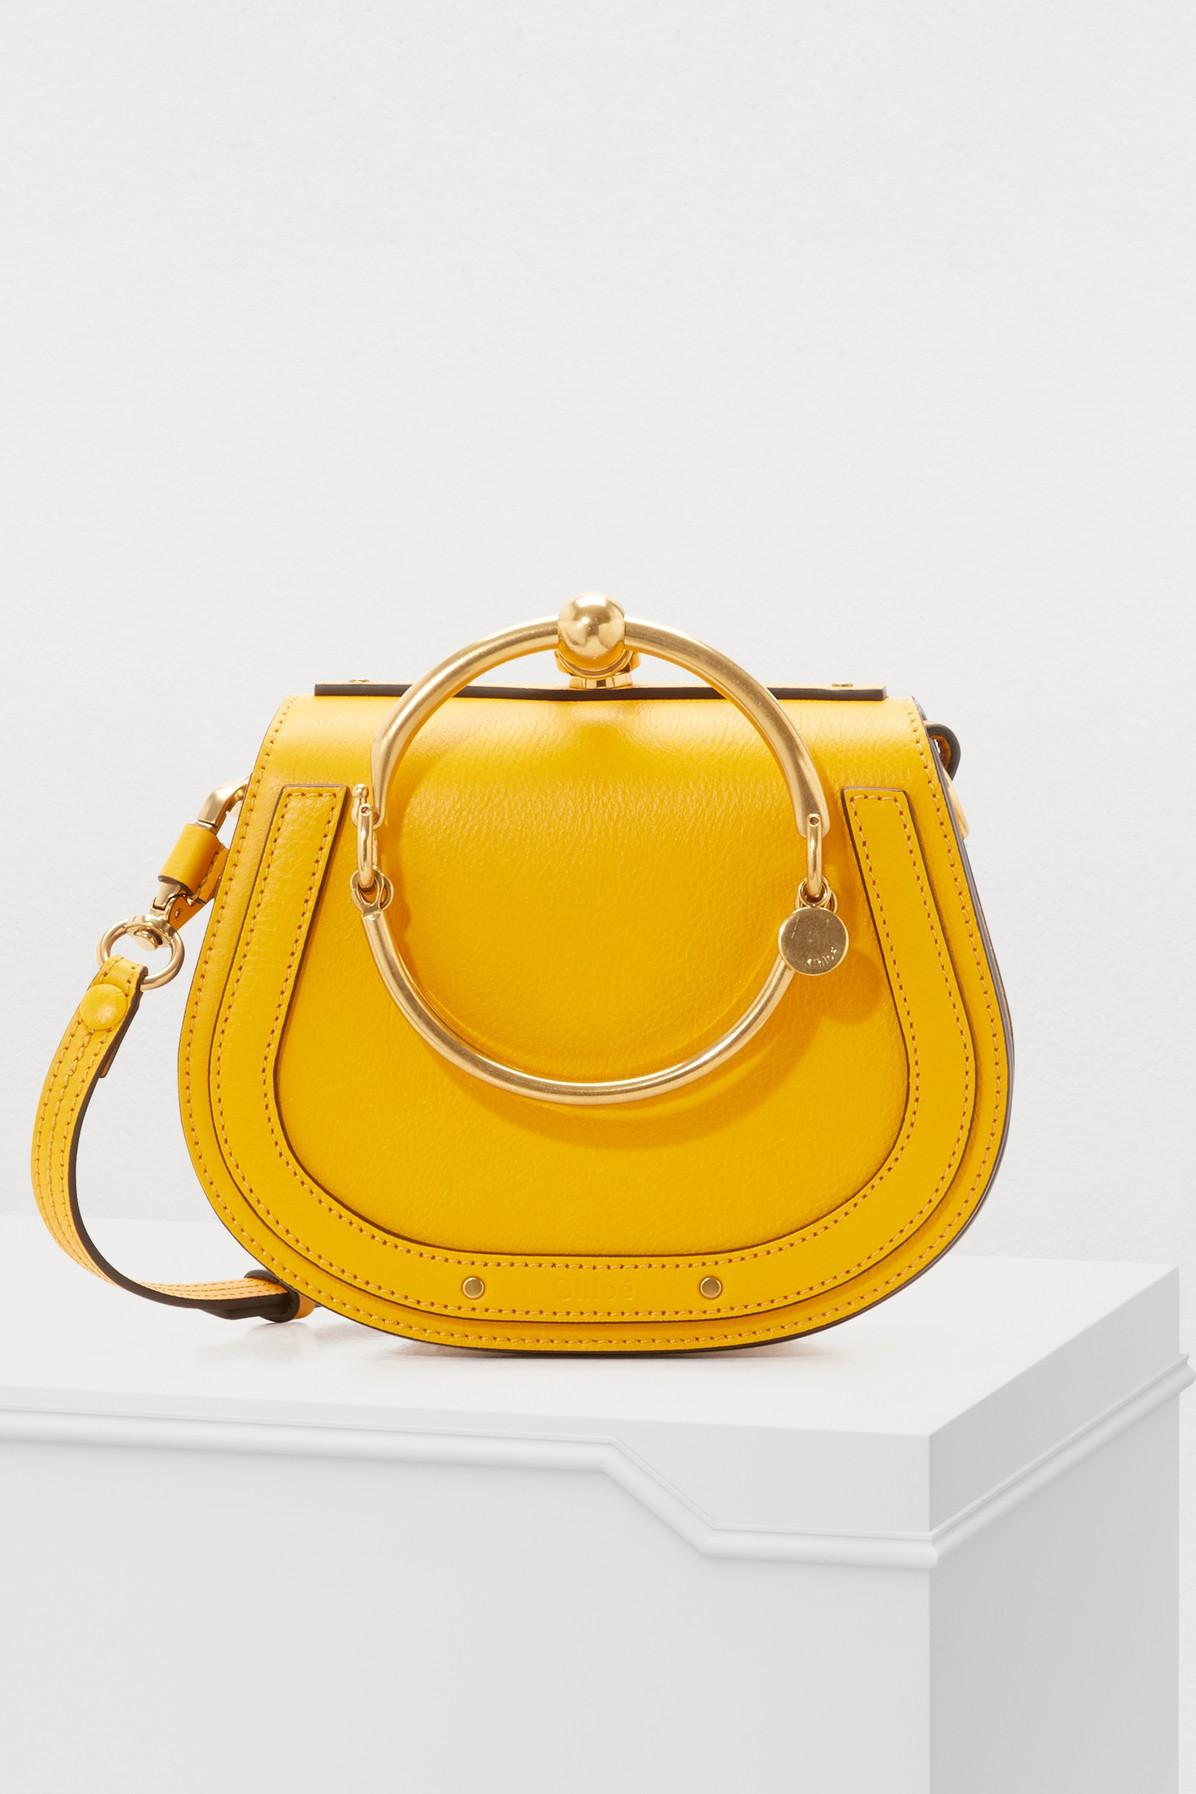 ChloÉ Small Nile Bracelet Leather Crossbody Bag In Dark Ochre